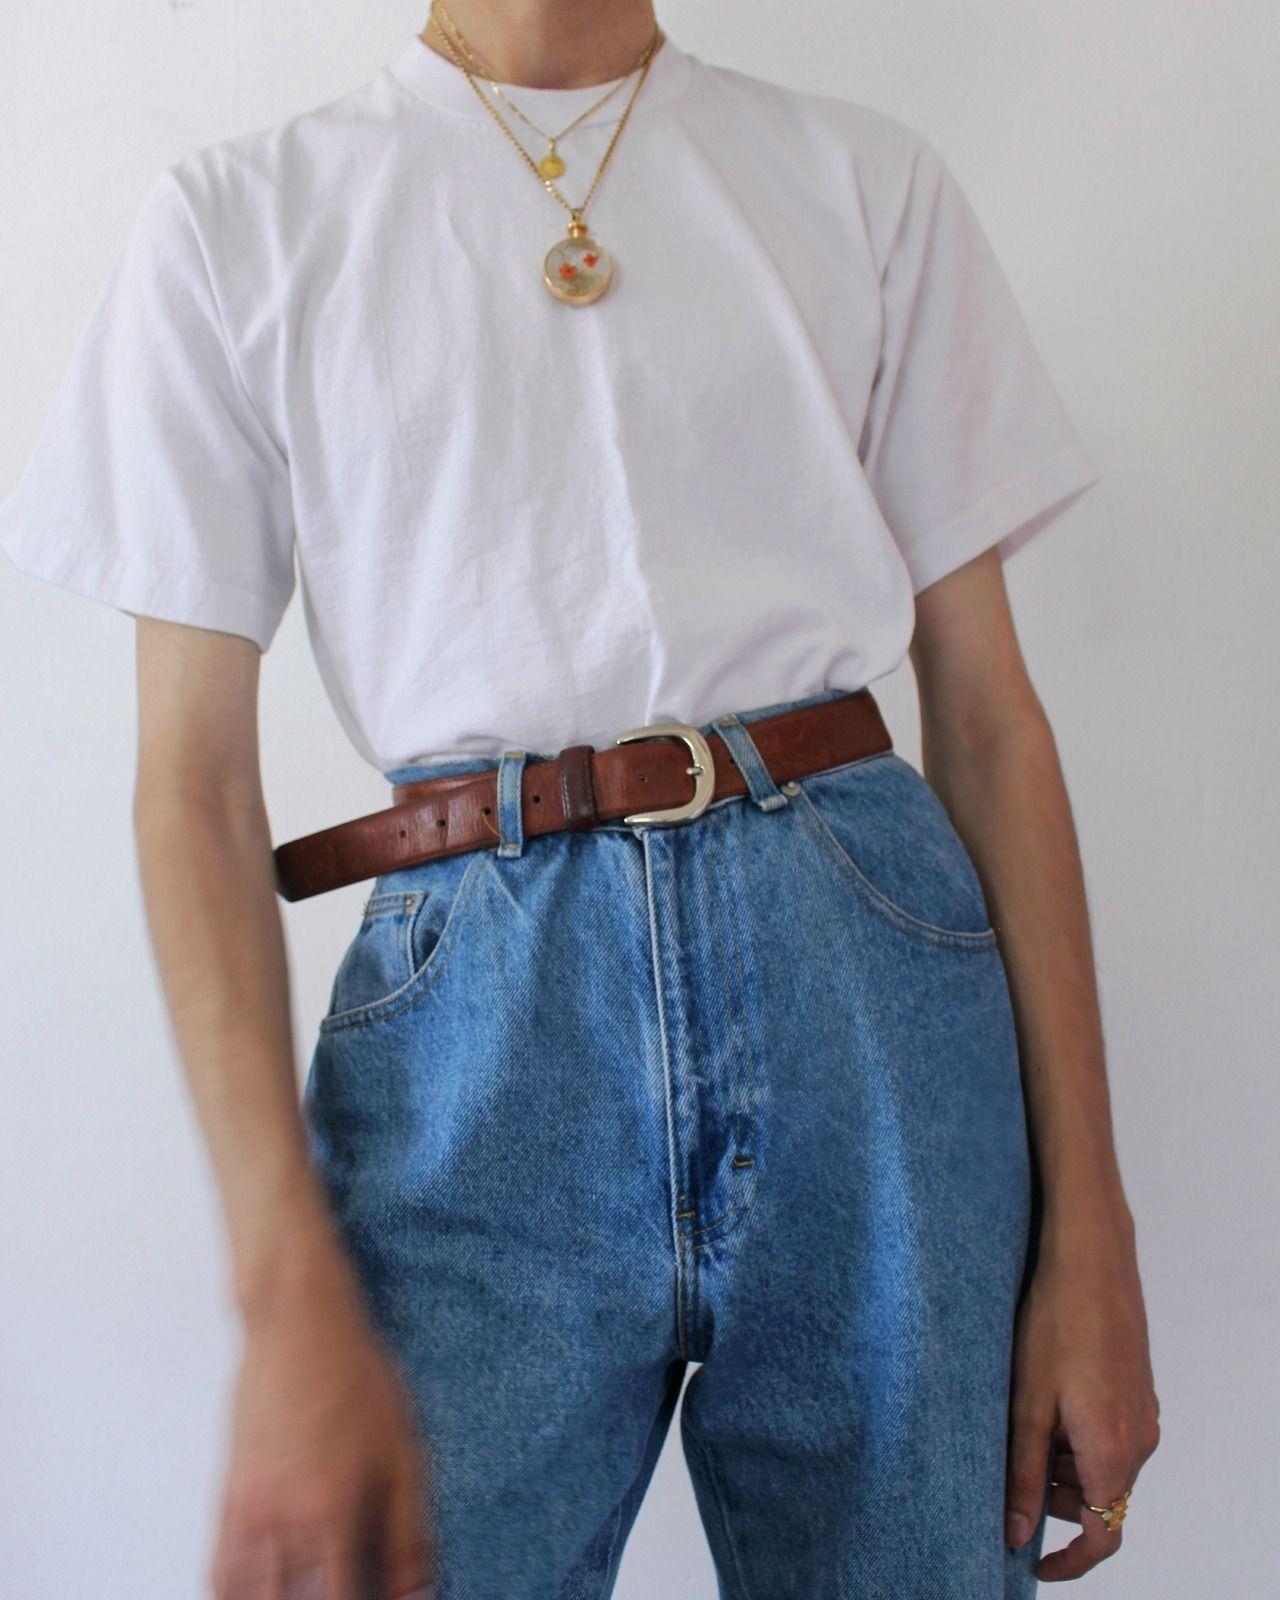 Alex Retro Outfits Aesthetic Clothes Clothes